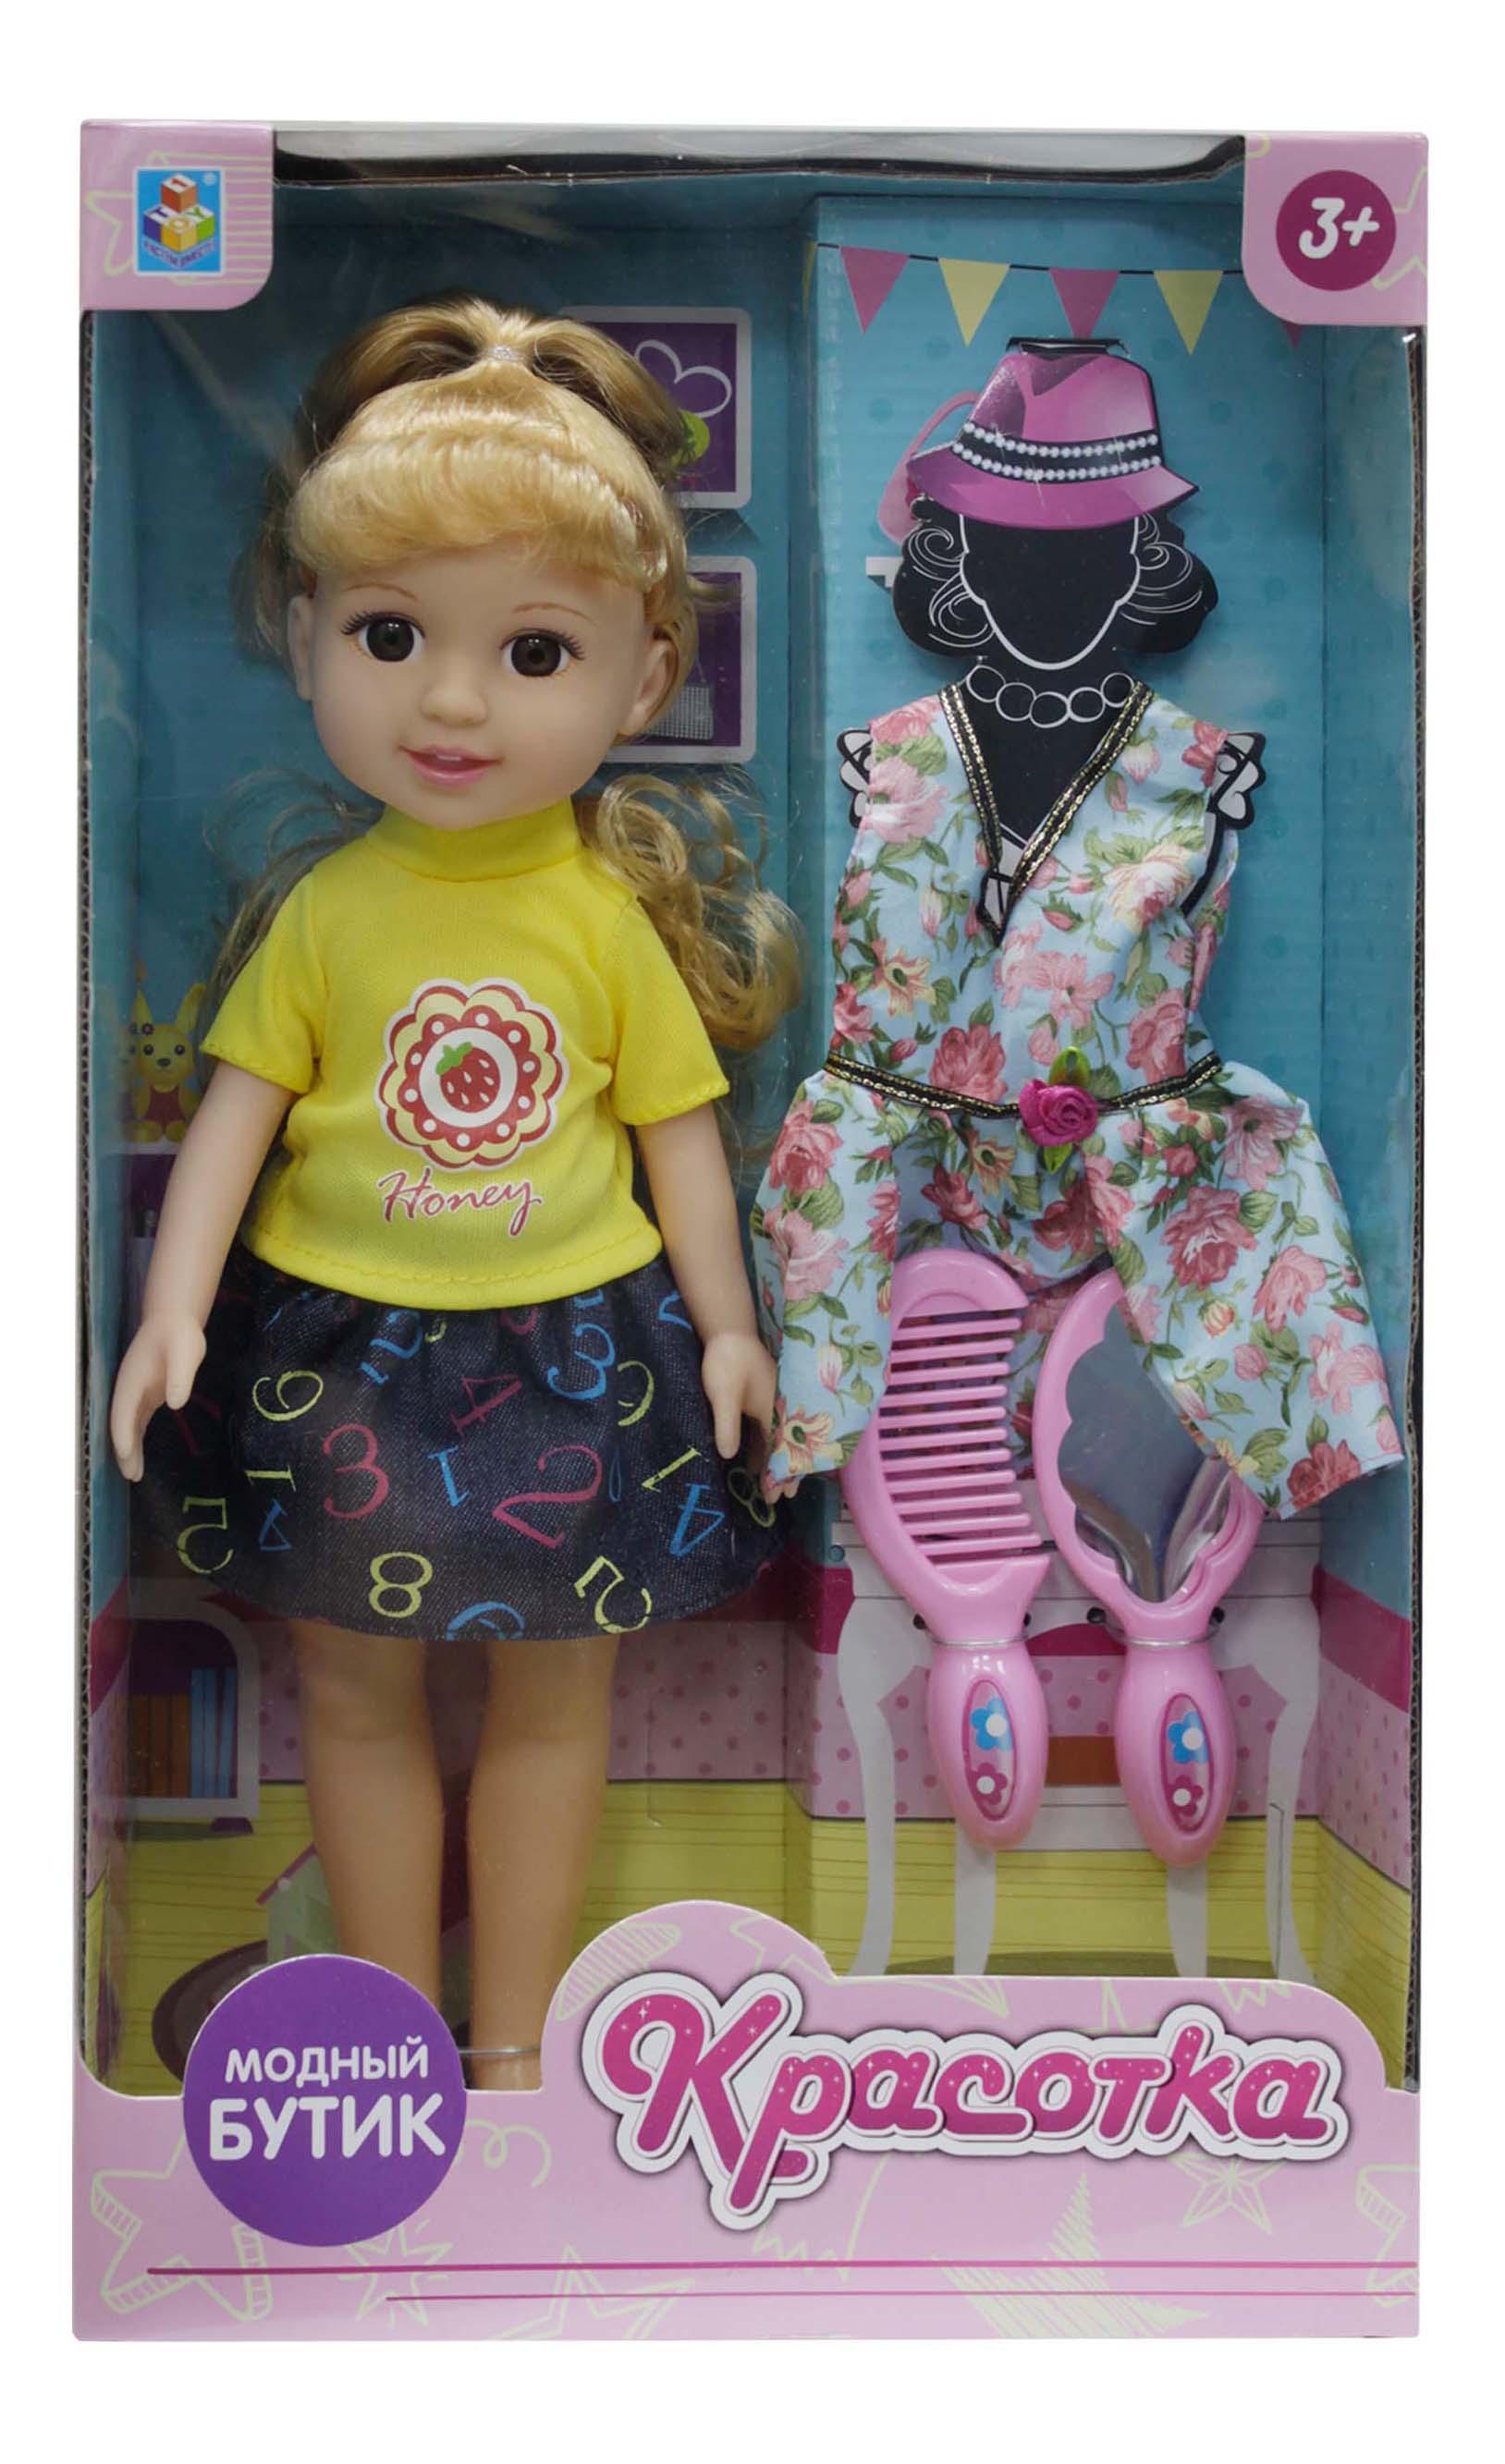 Кукла красотка с аксессуарами модный бутик блондинка 1Toy т10279